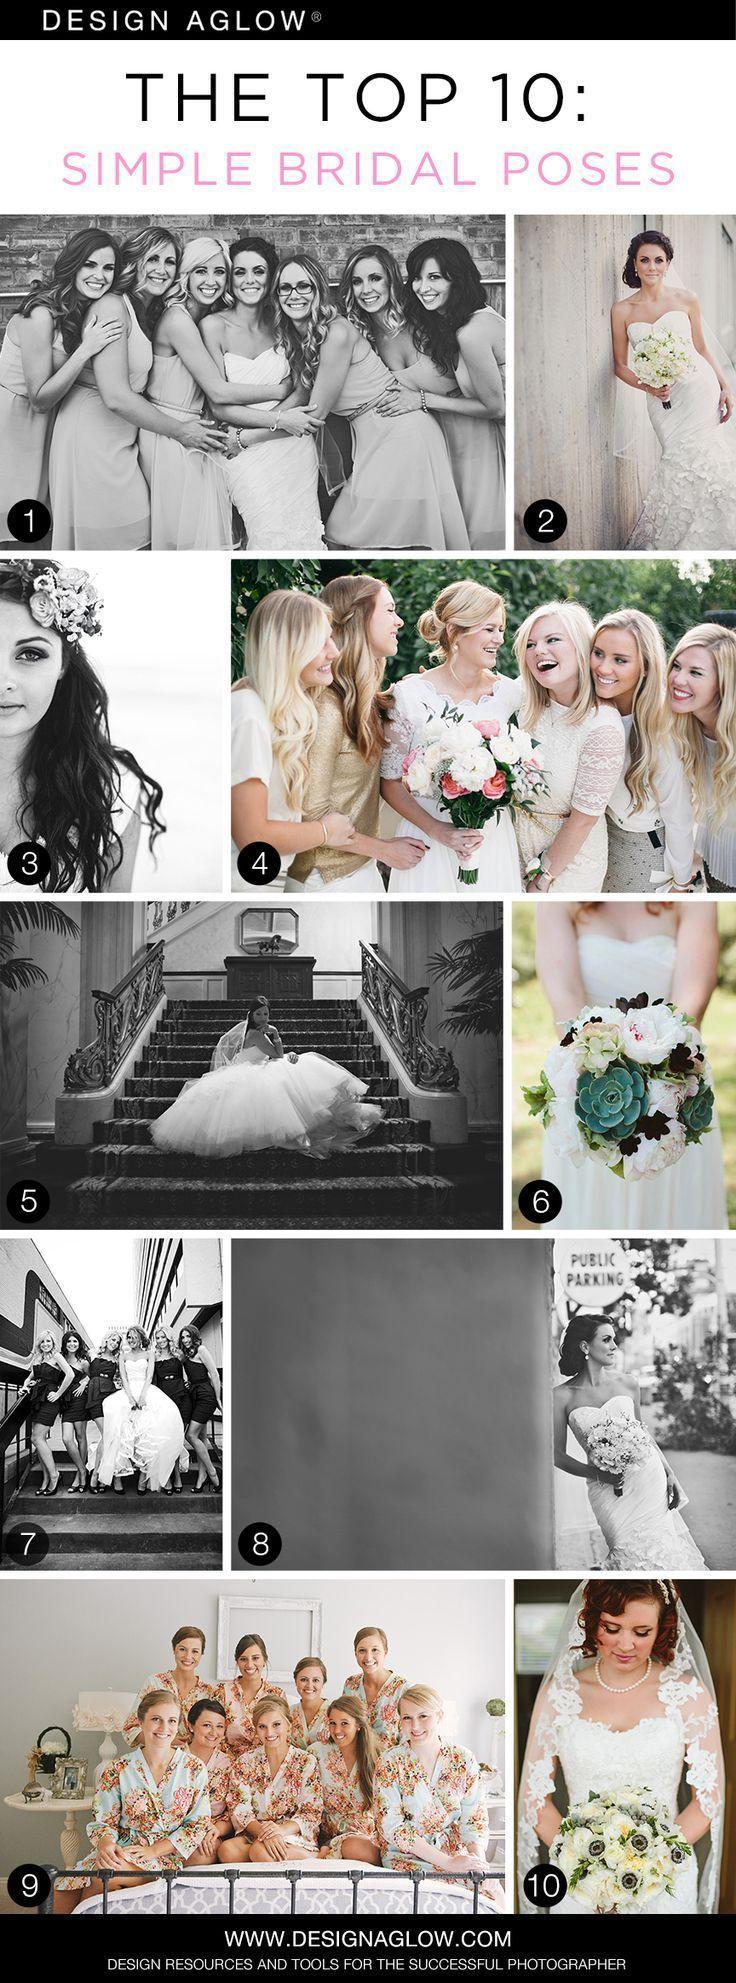 Inspire Me Cards: Bridal Posing Guide - #Bridal #Cards #Guide #Inspire #Posing - Wedding Fotoshooting